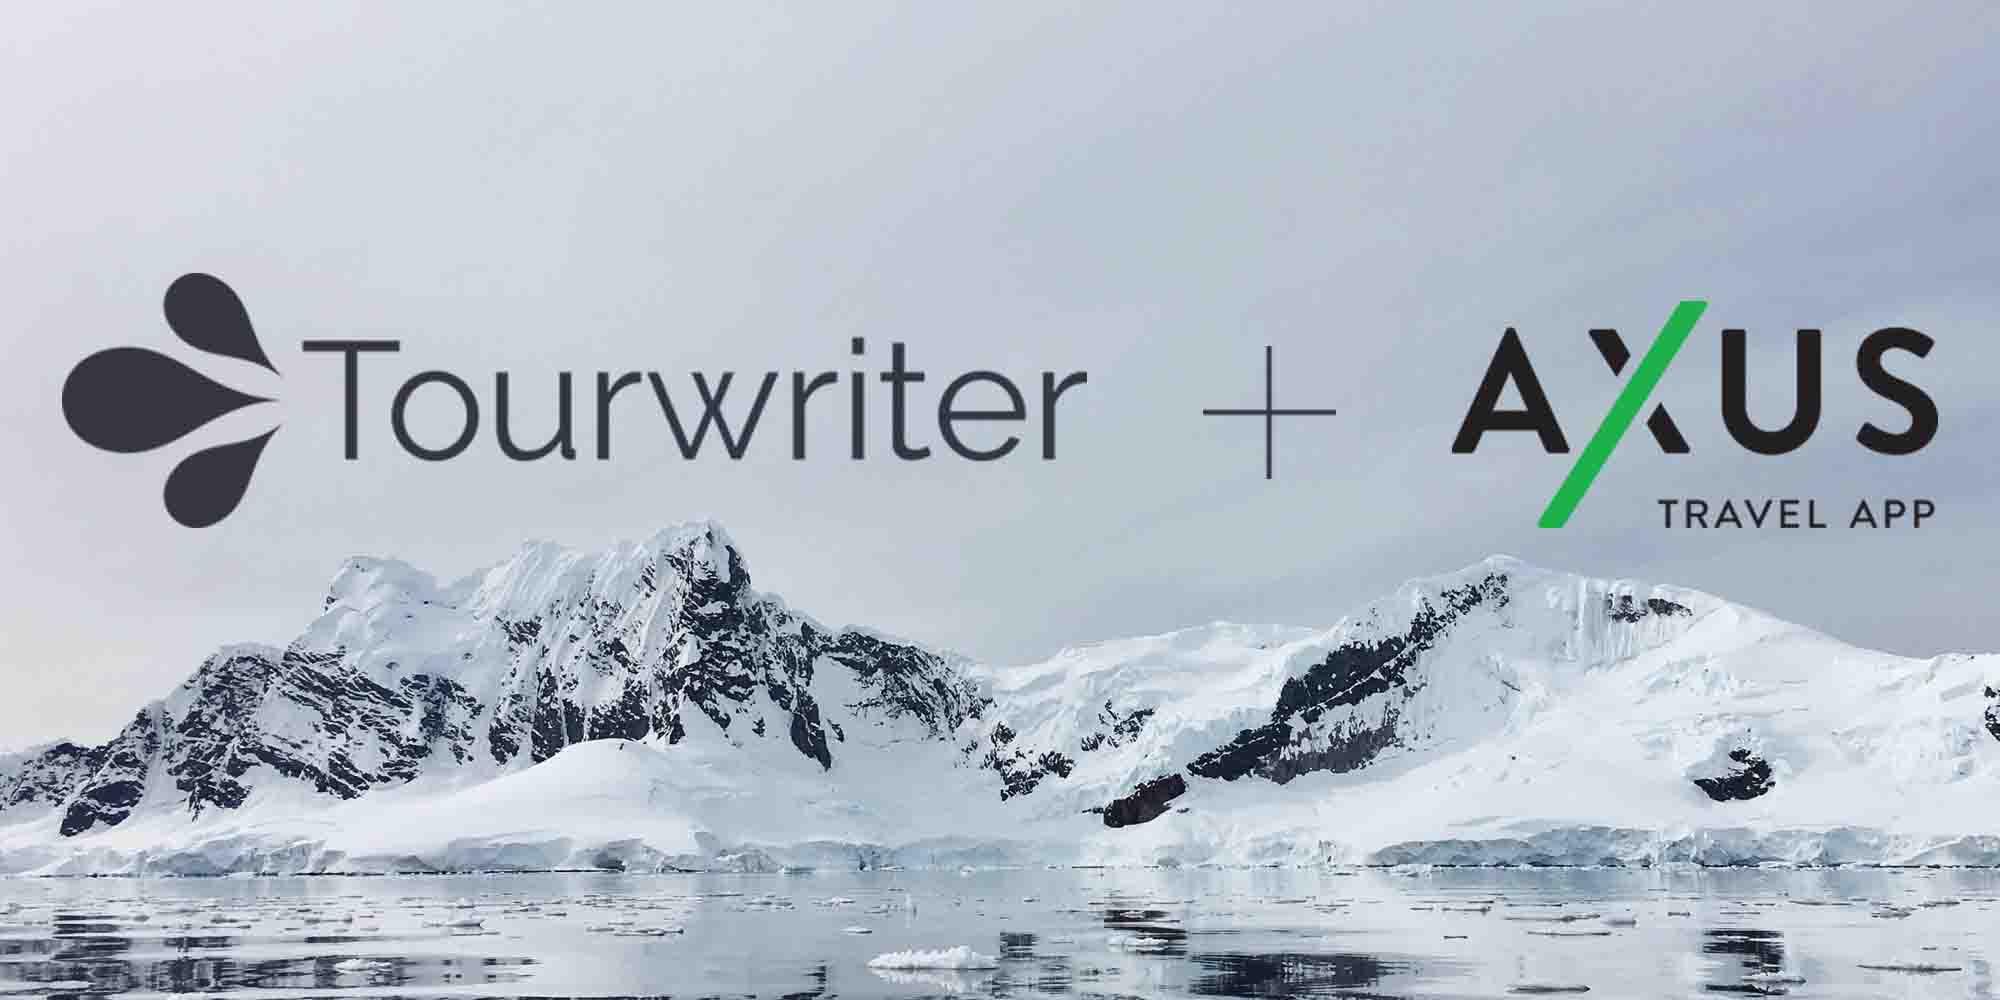 Tourwriter Axus integration